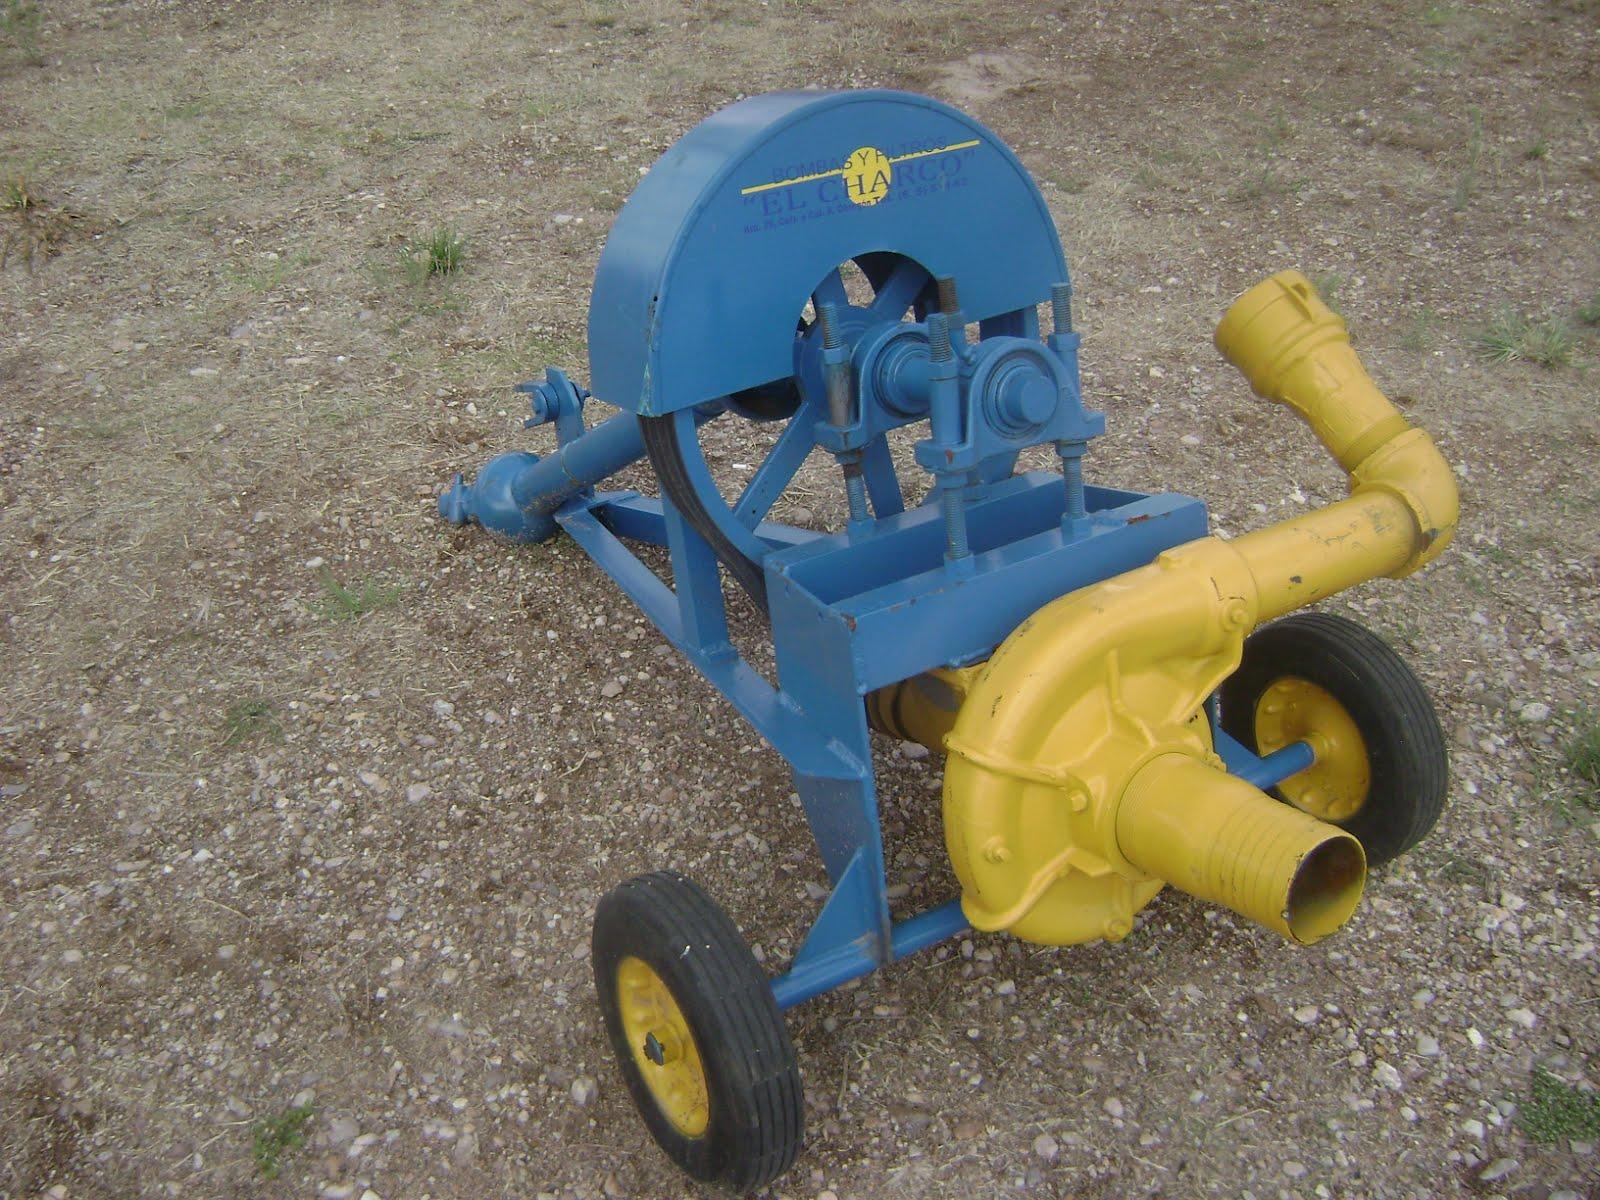 Maquinaria agricola industrial bomba charquera 12 500 pesos - Bomba para sacar agua ...